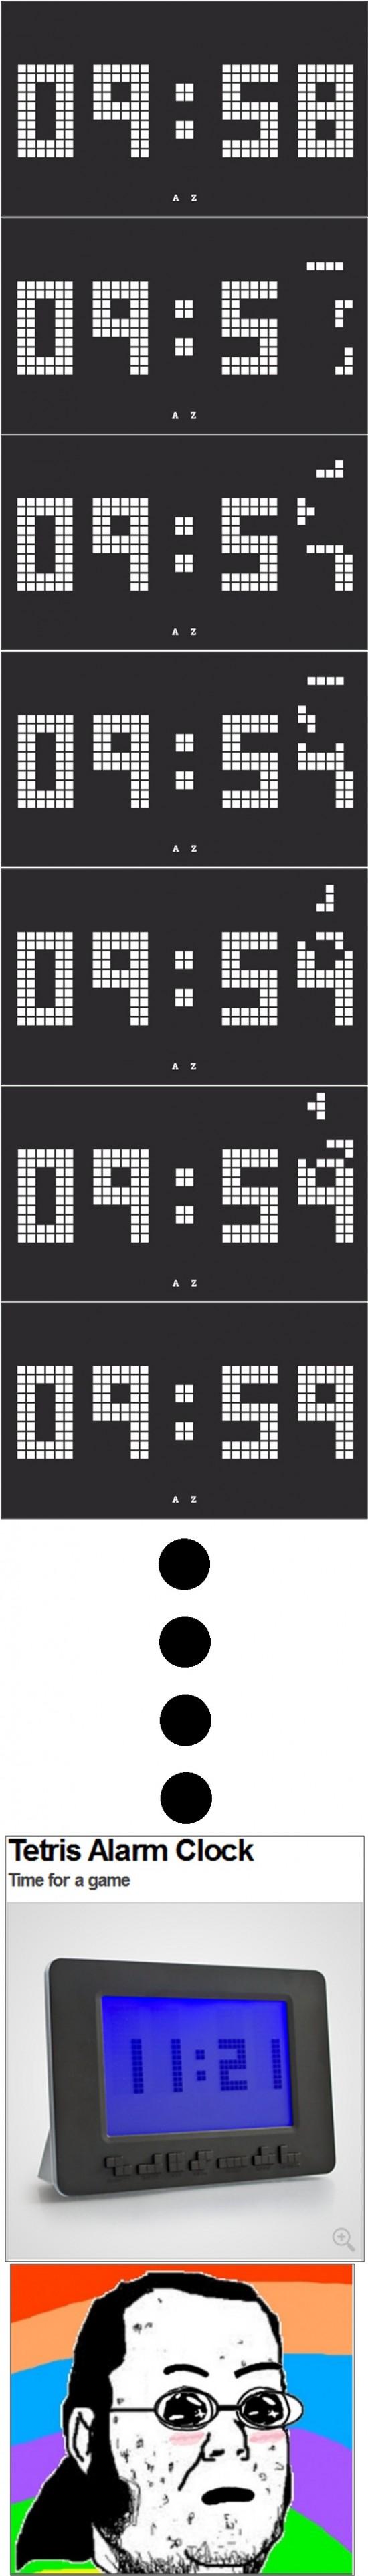 alarma,amazed,friki,gordo granudo,reloj,Tetris